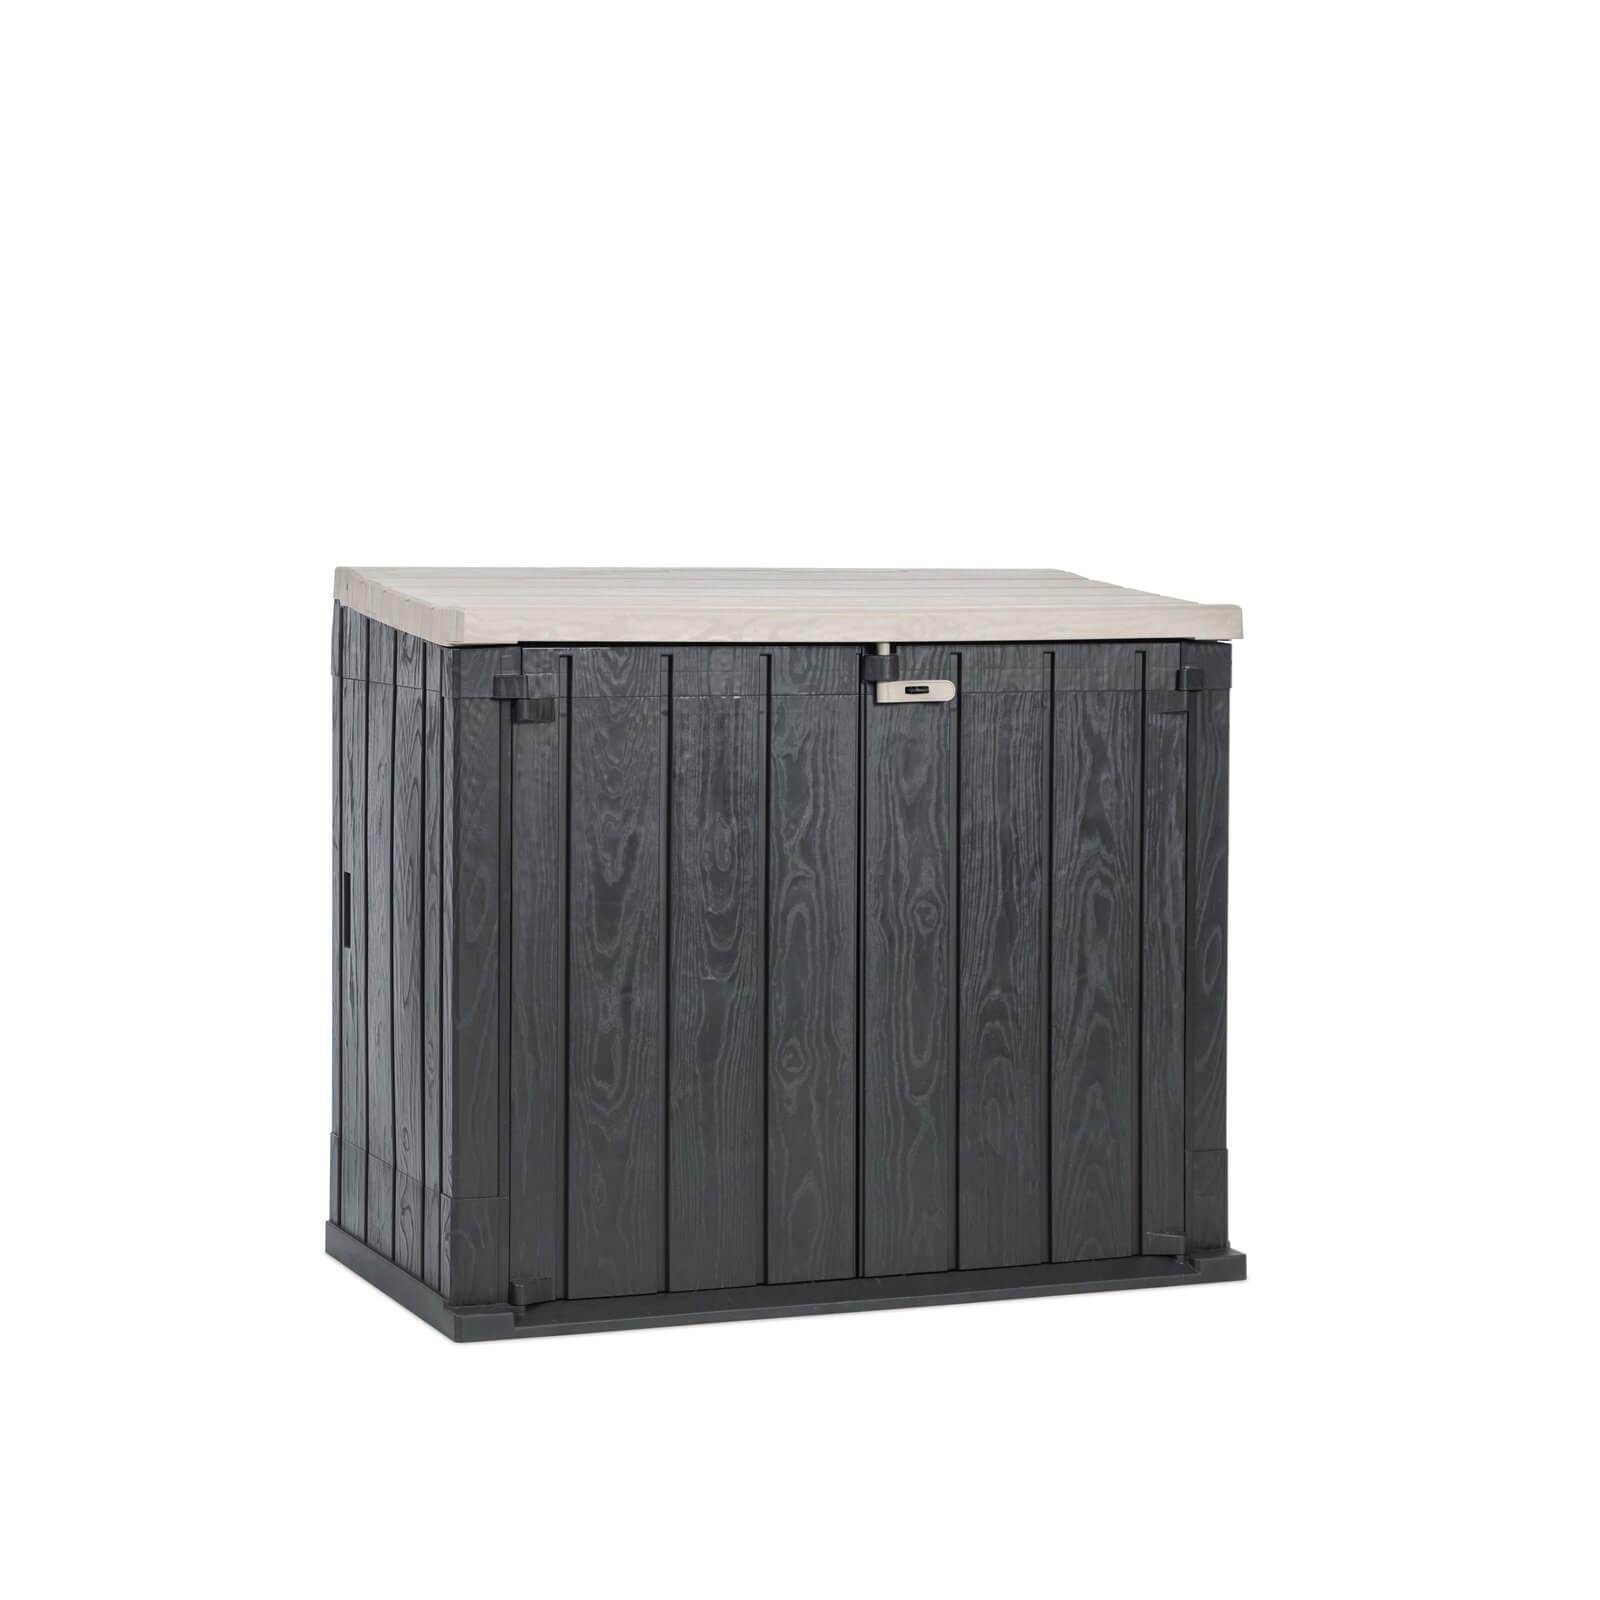 Toomax Stora Way 842L Garden Storage Box in Warm Grey